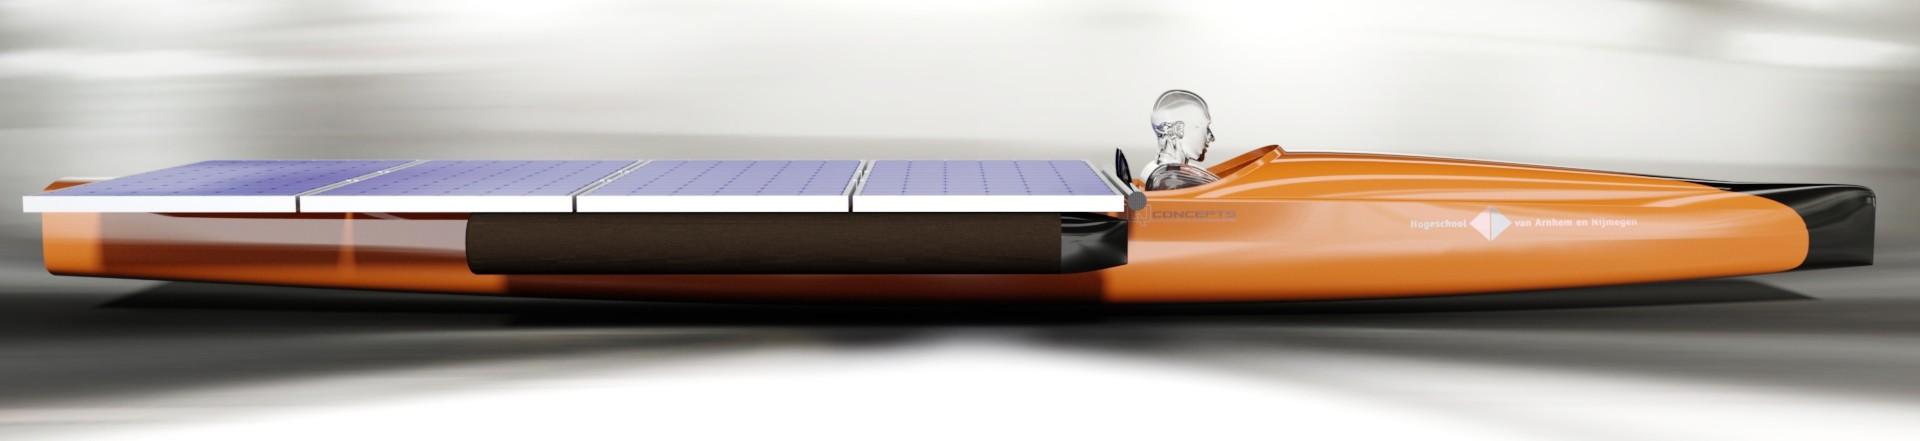 Han Solar Boat3